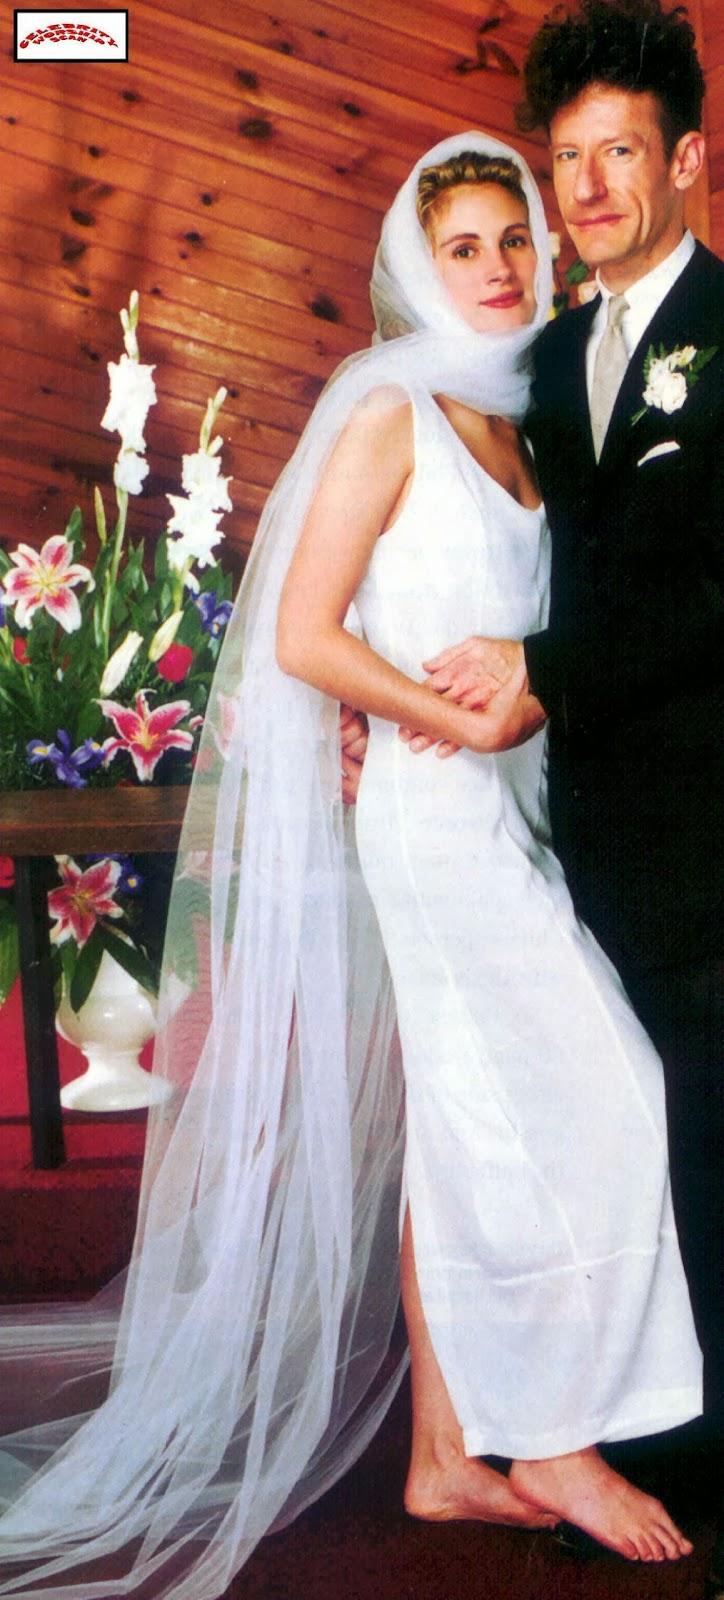 Lyle Lovett And Julia Roberts Wedding